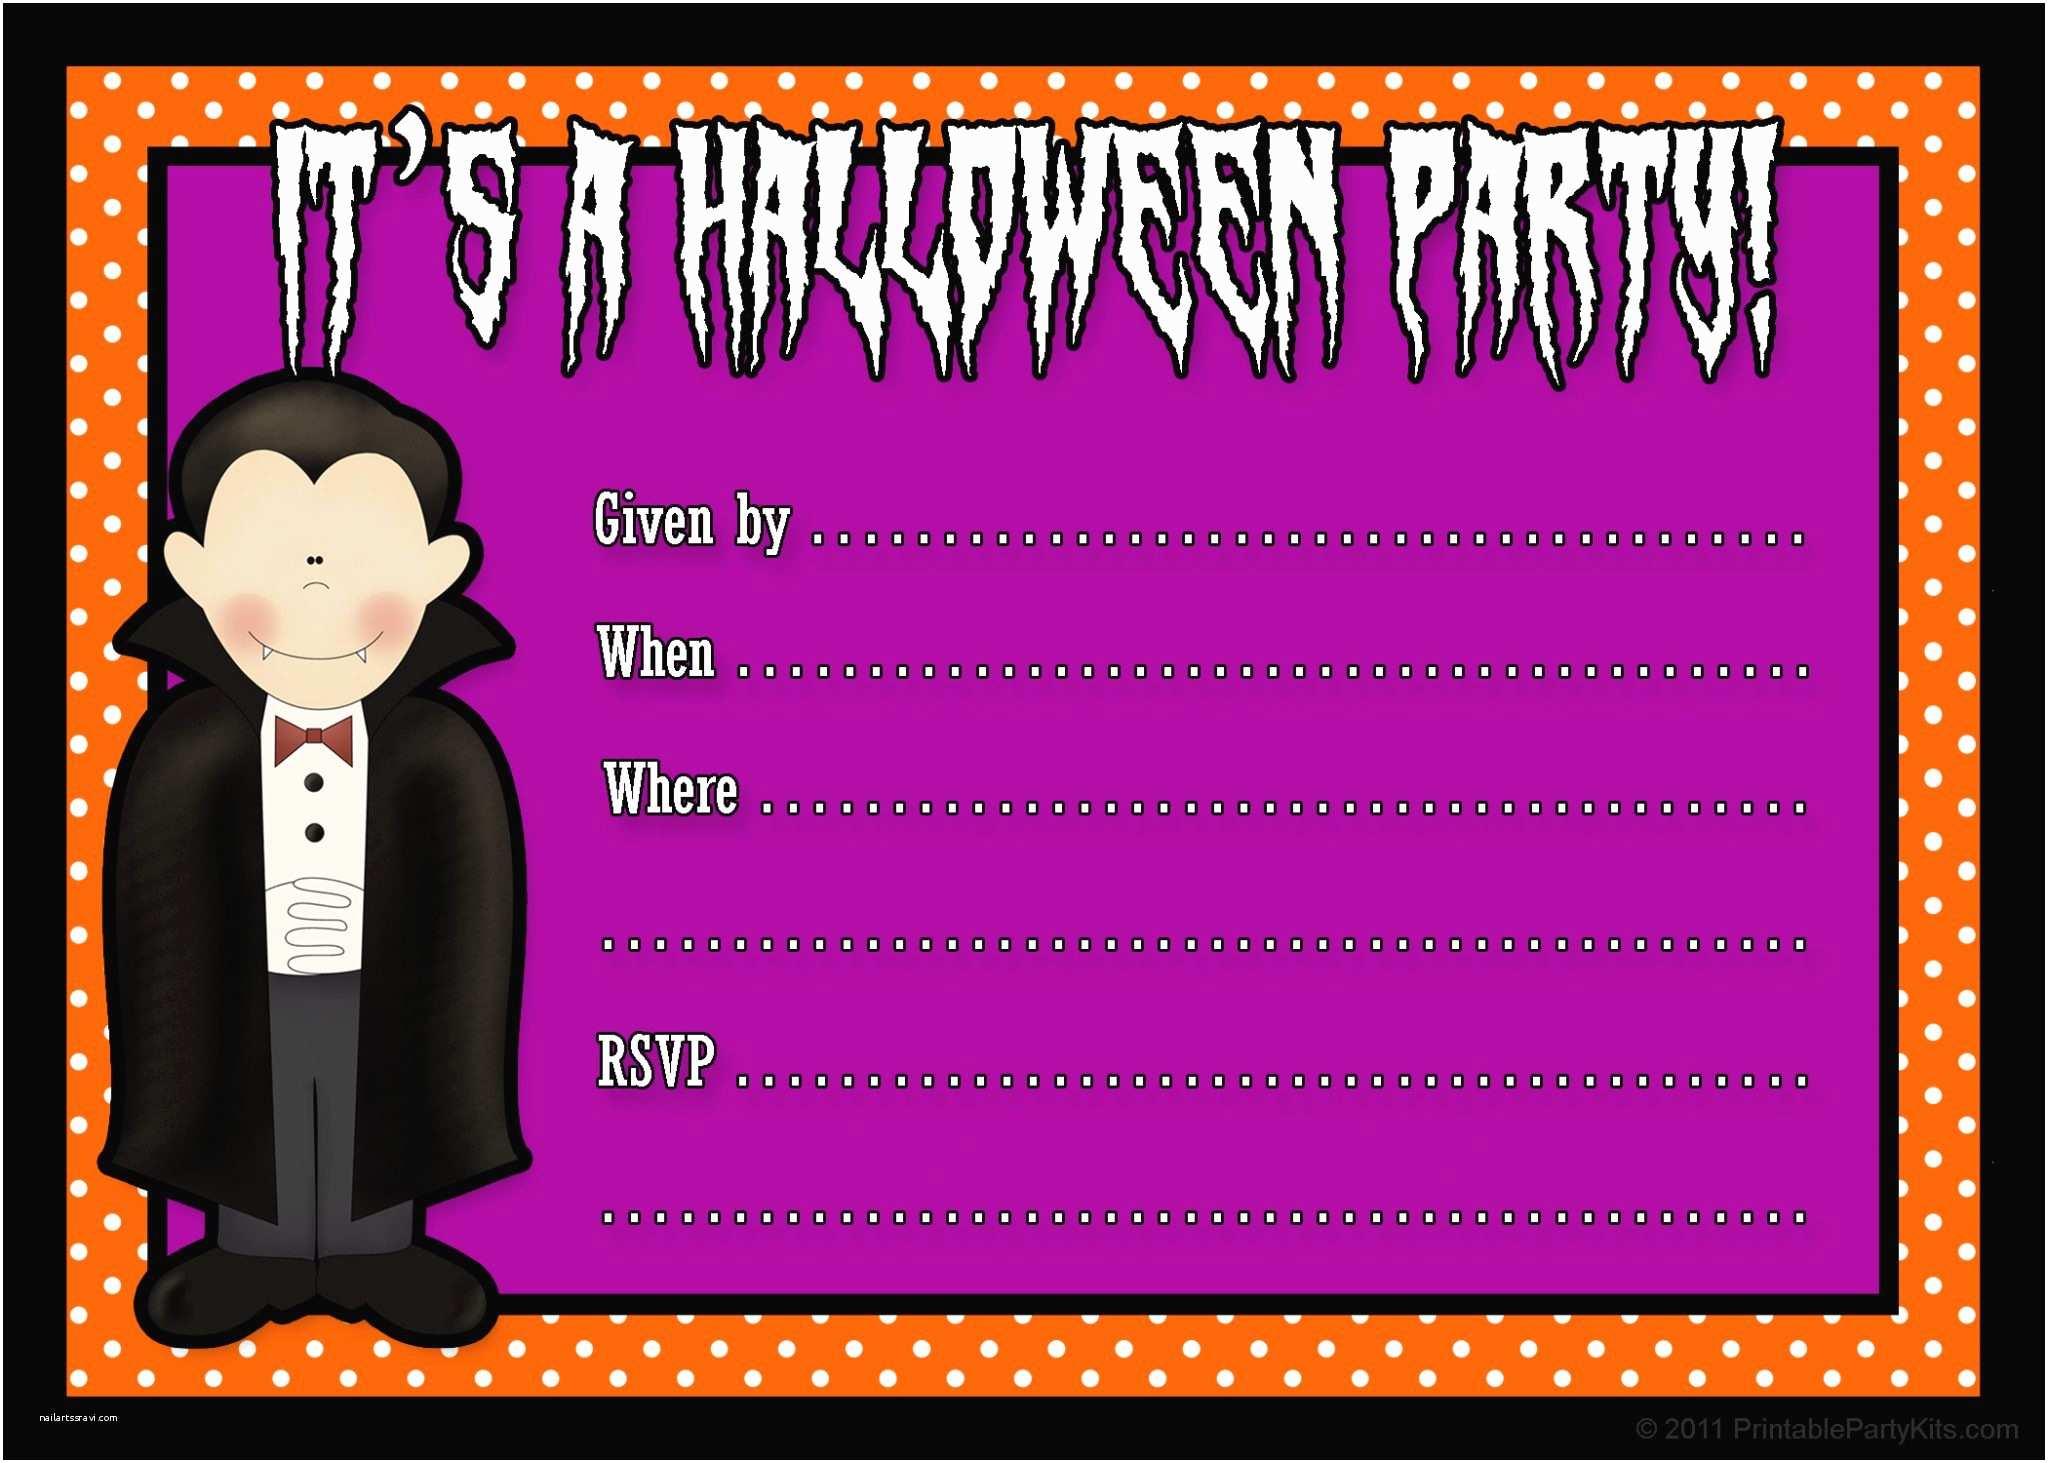 Halloween Party Invitations Invitations